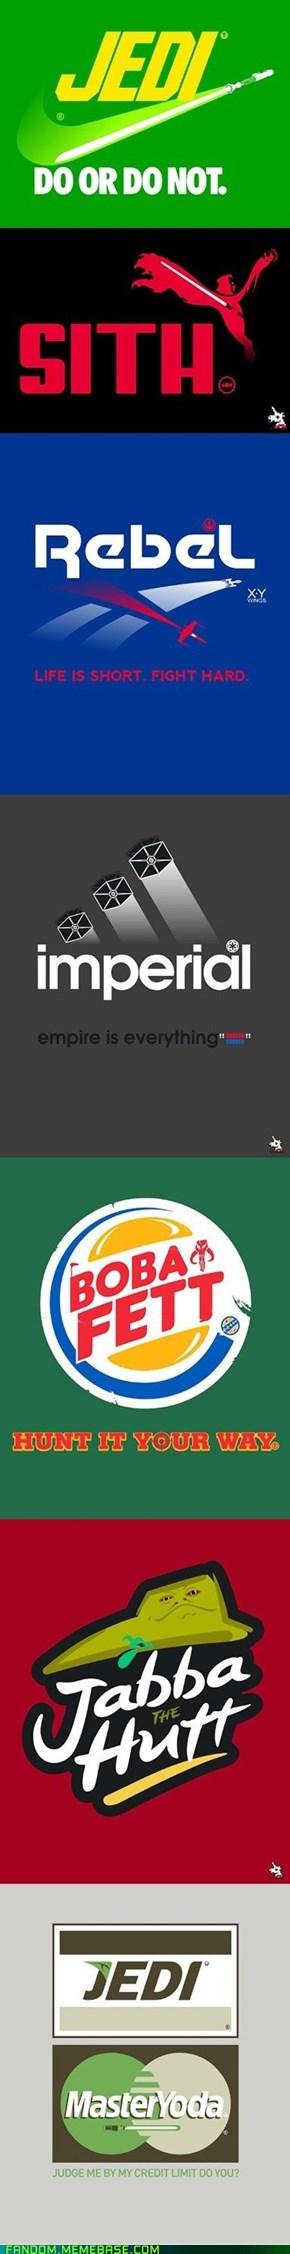 Galactic Advertising